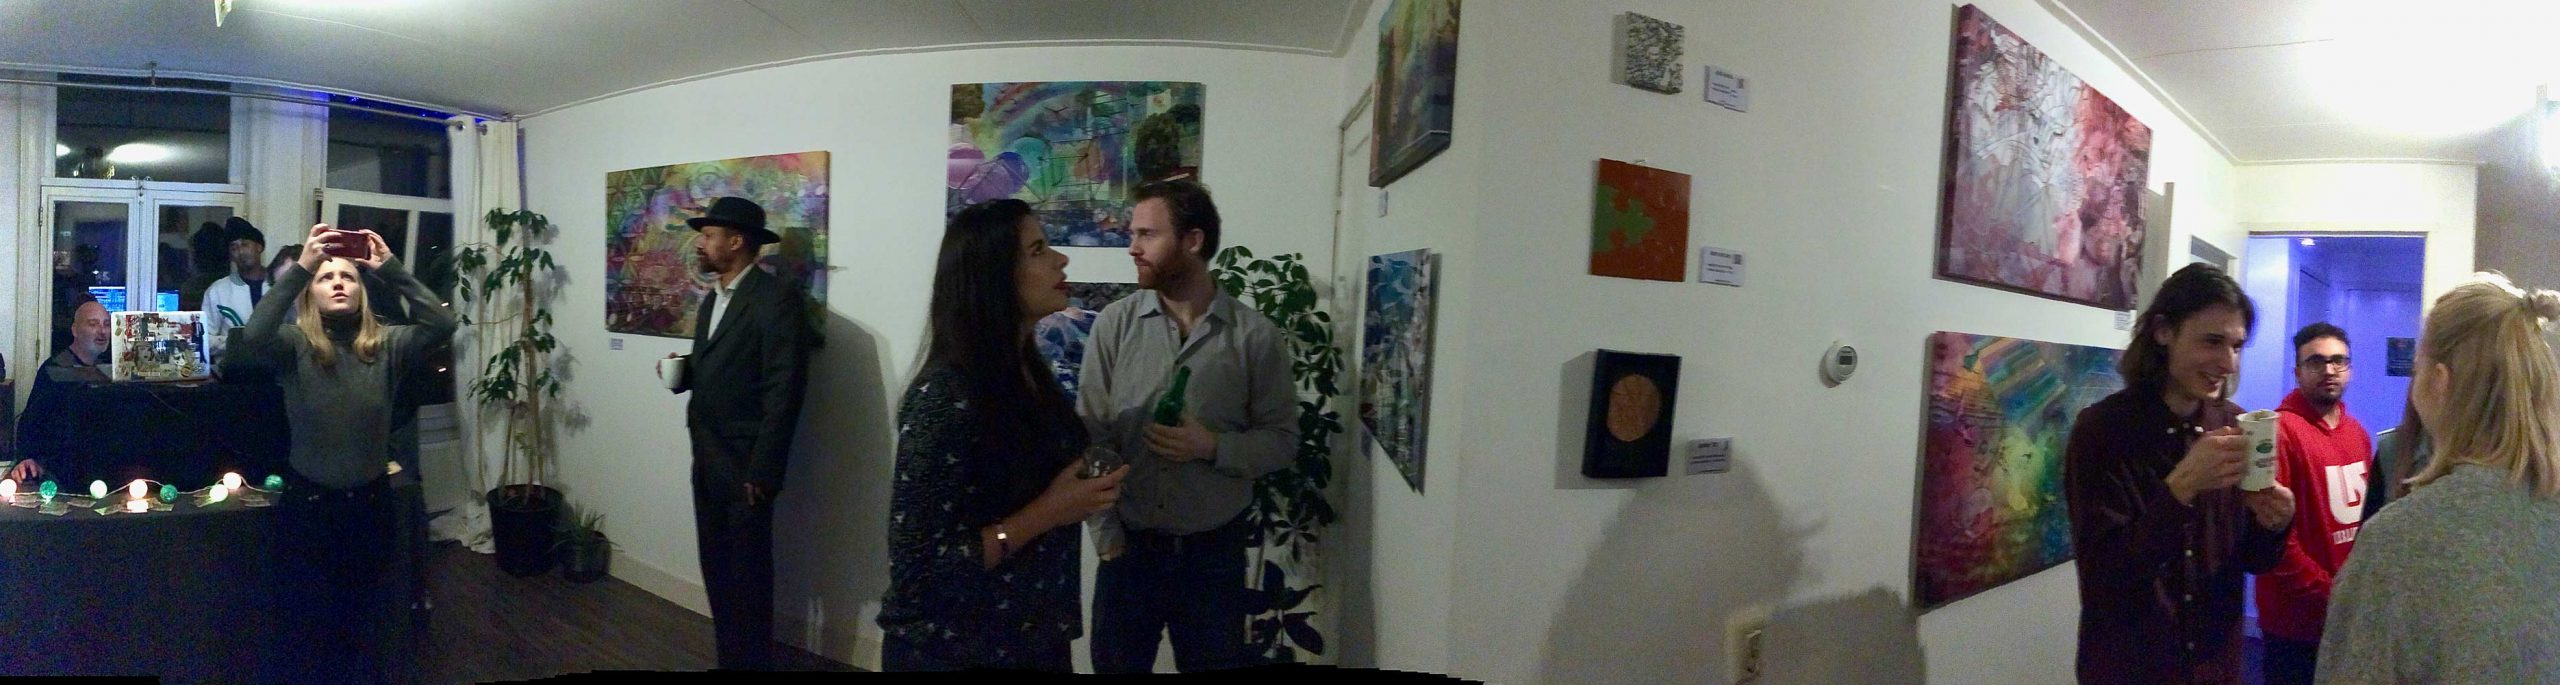 Expo Meet The Artist, Amsterdam